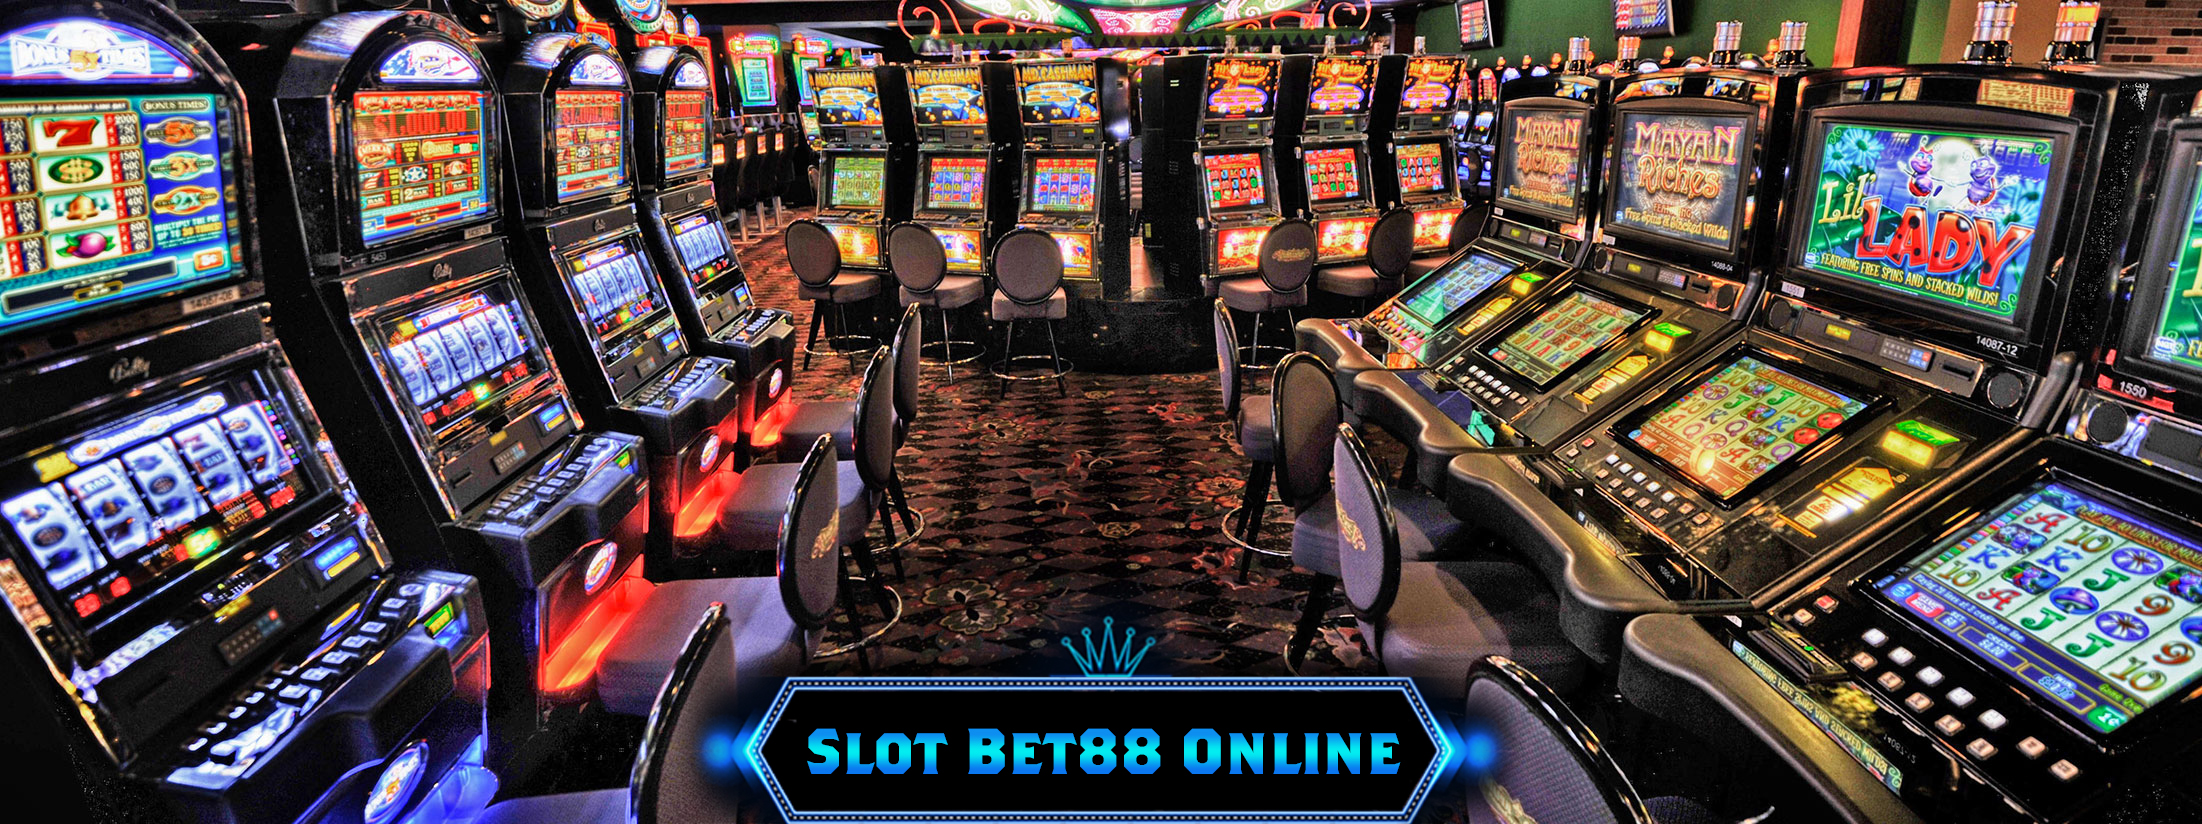 Casino Tradisional